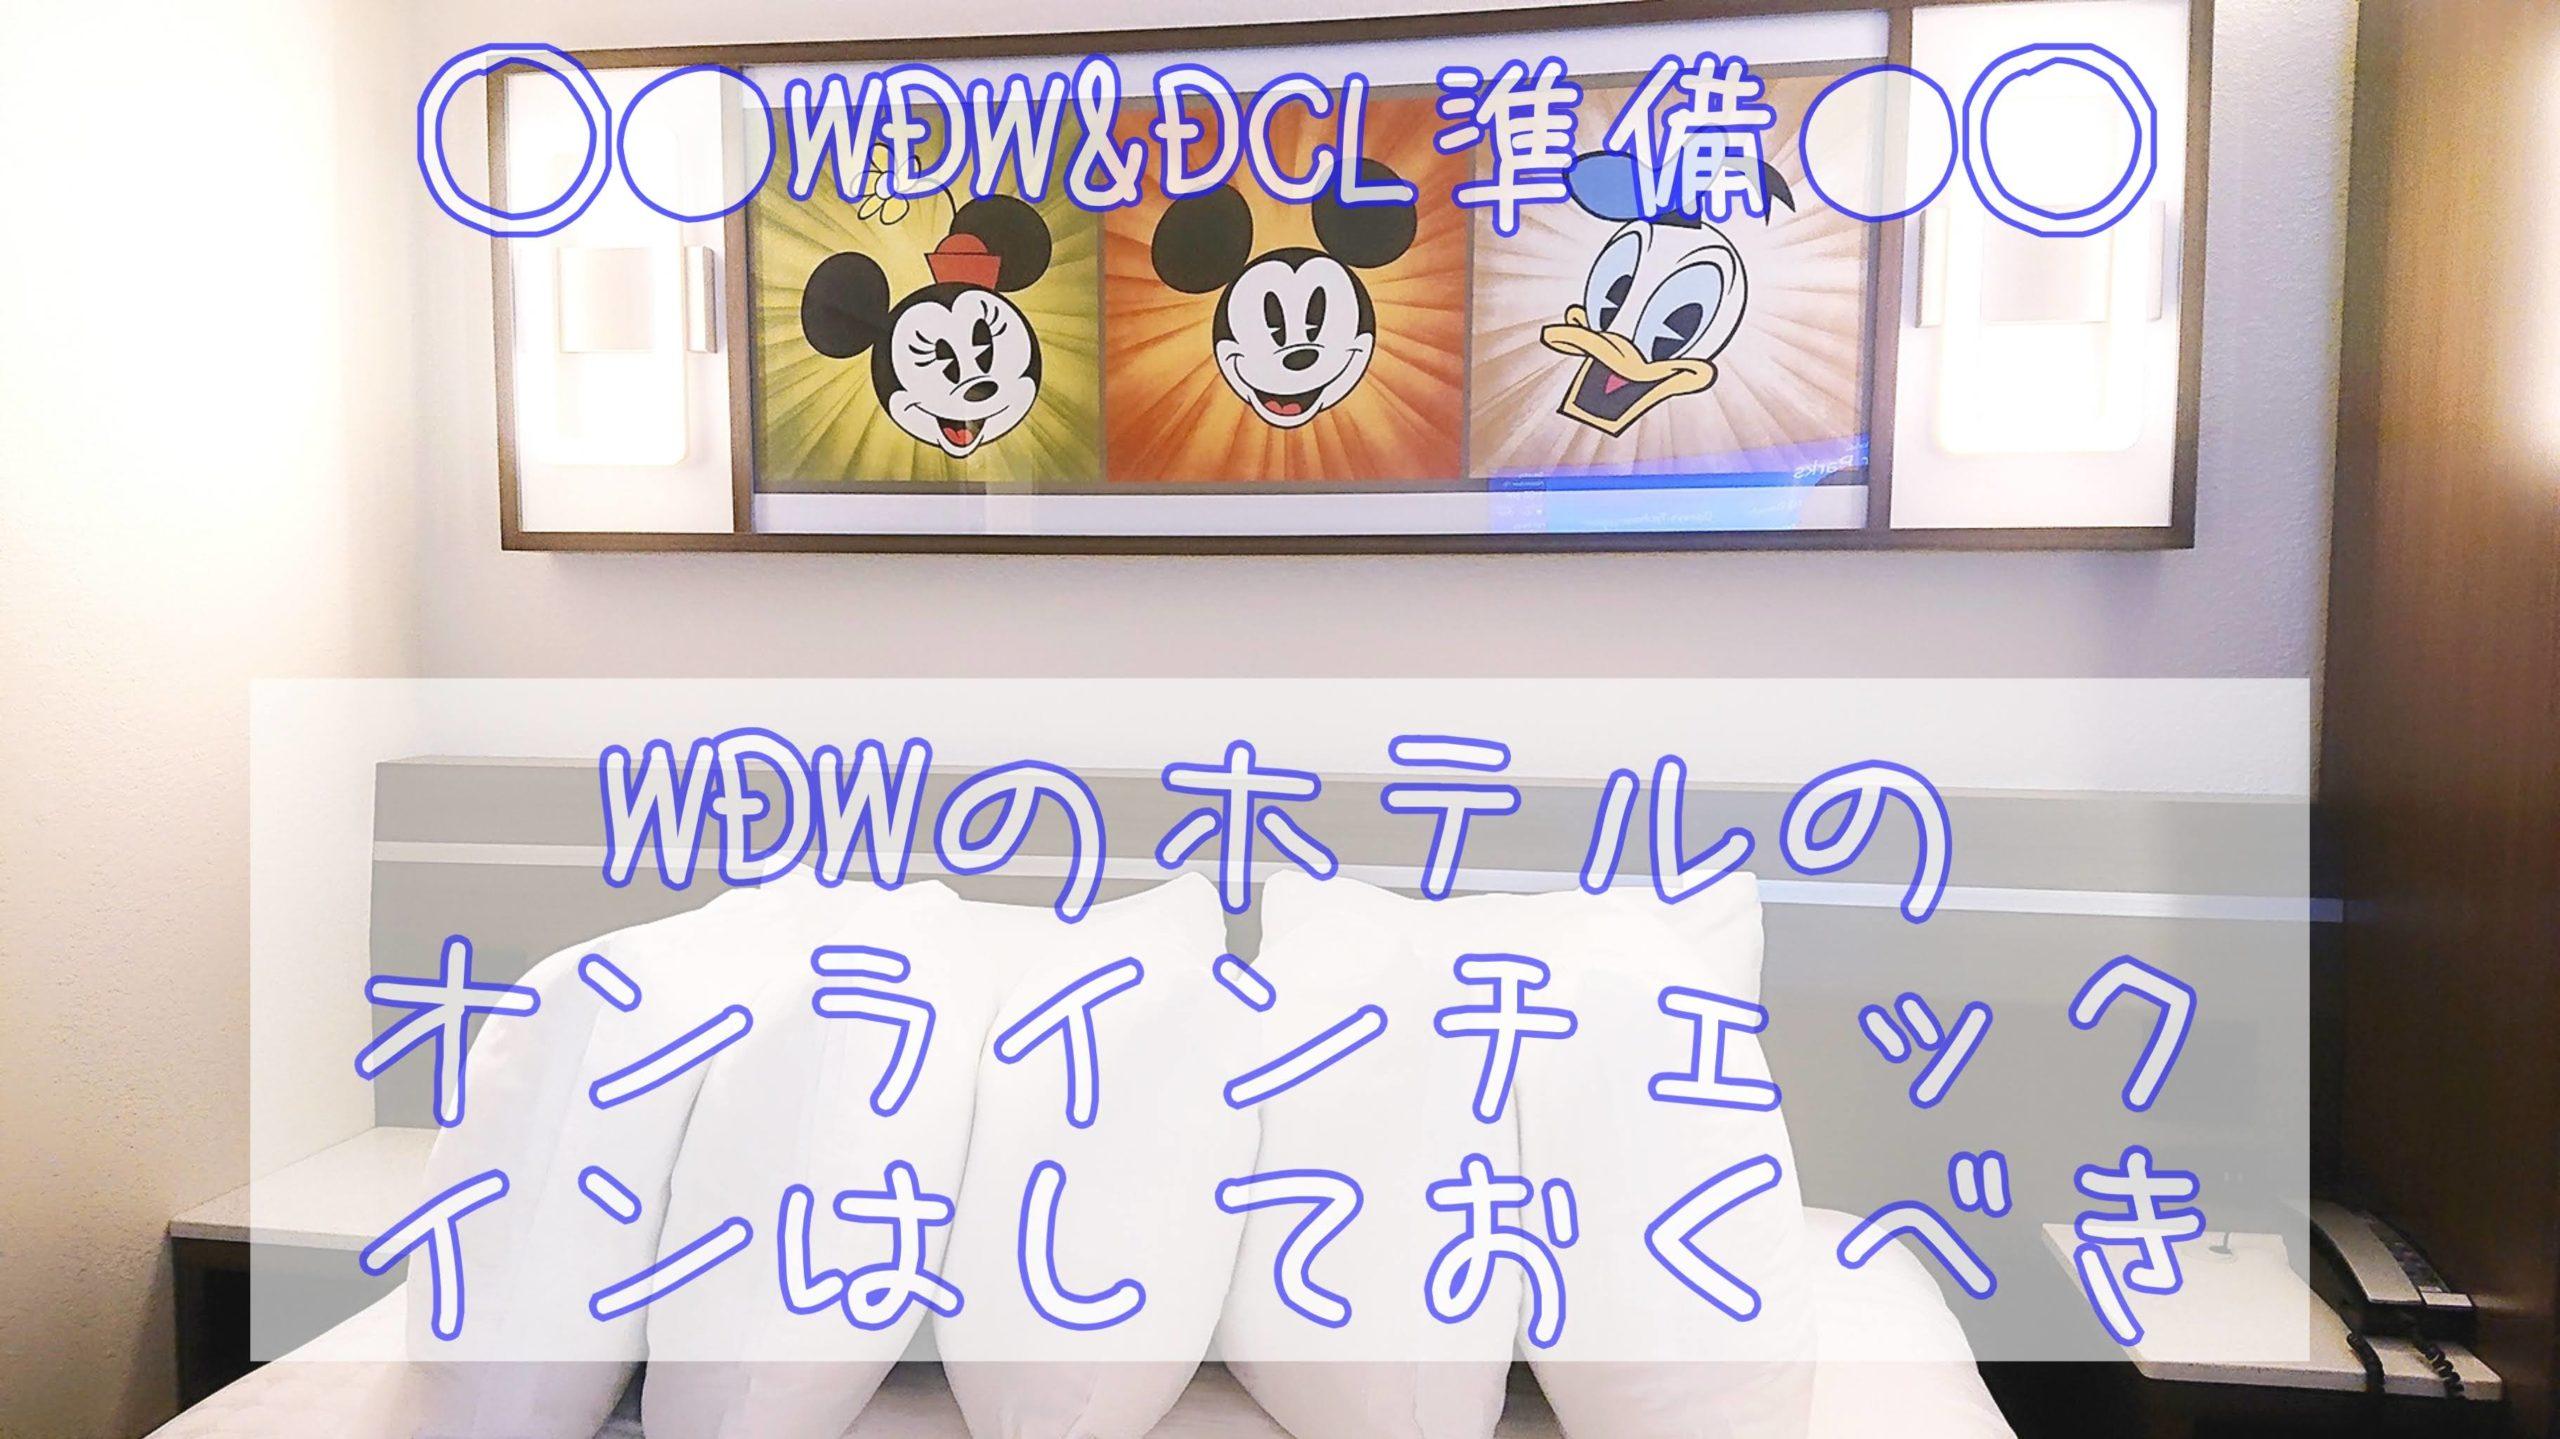 WDWホテルのオンラインチェックインを事前に済ませておくメリットとは?タイミングや手順を紹介します